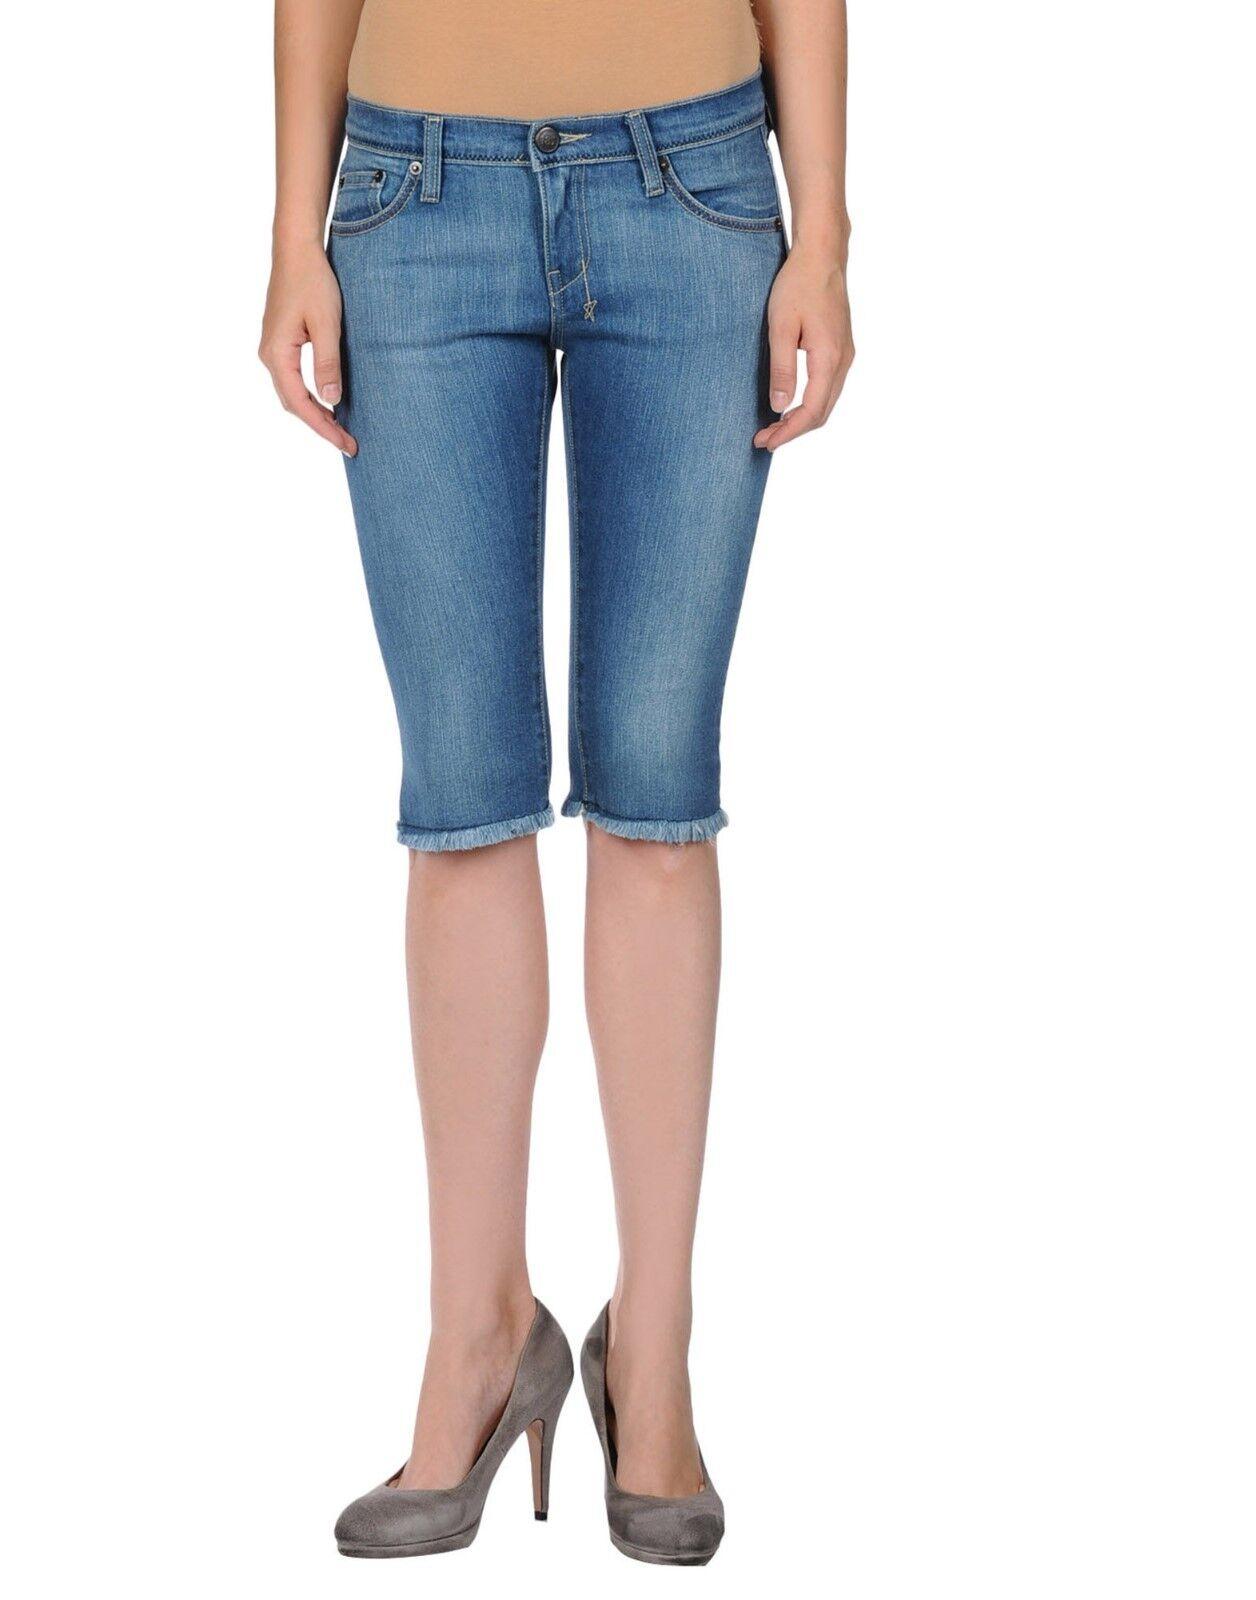 18th Amendment Monroe Bermuda Jean Shorts bluee MADE in AUSTRALIA - W26 L13